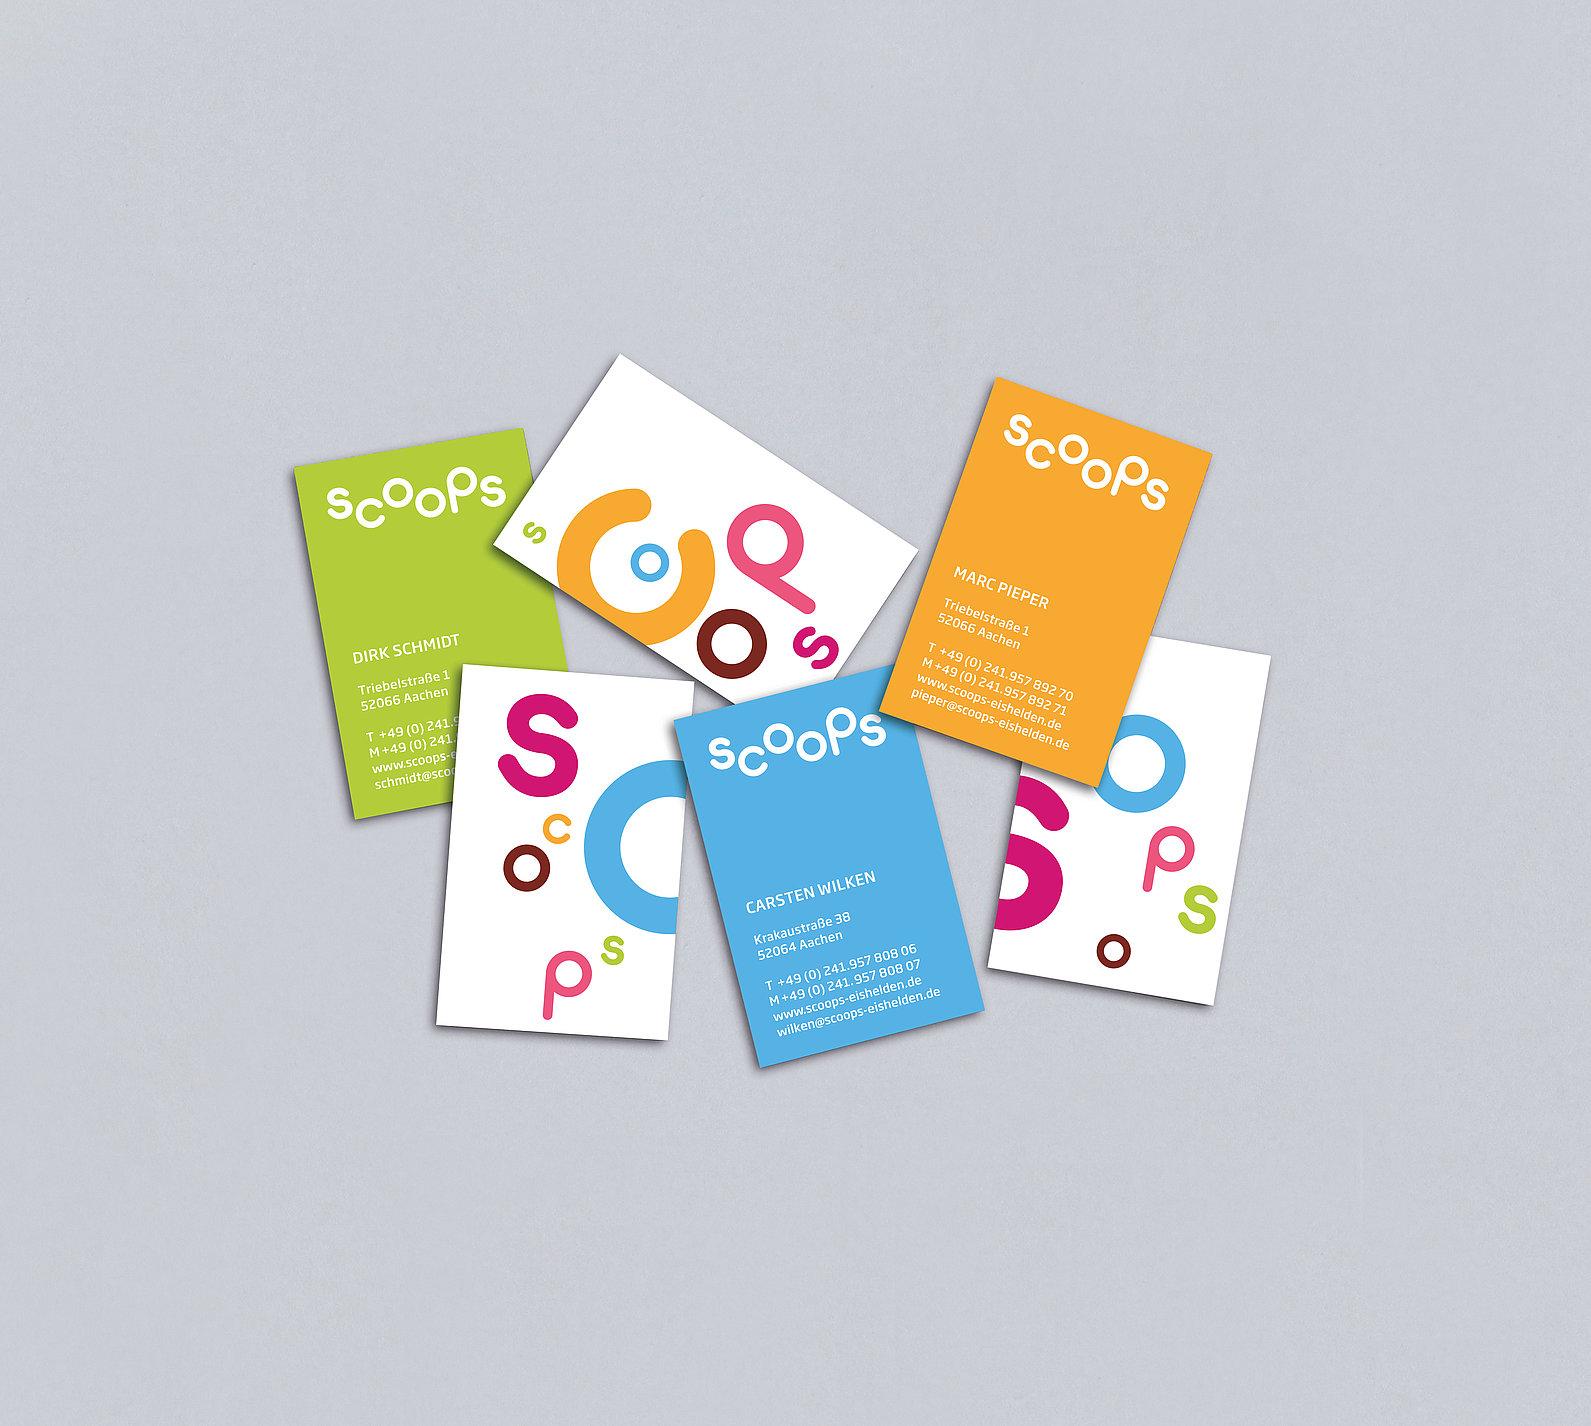 Scoops | Red Dot Design Award